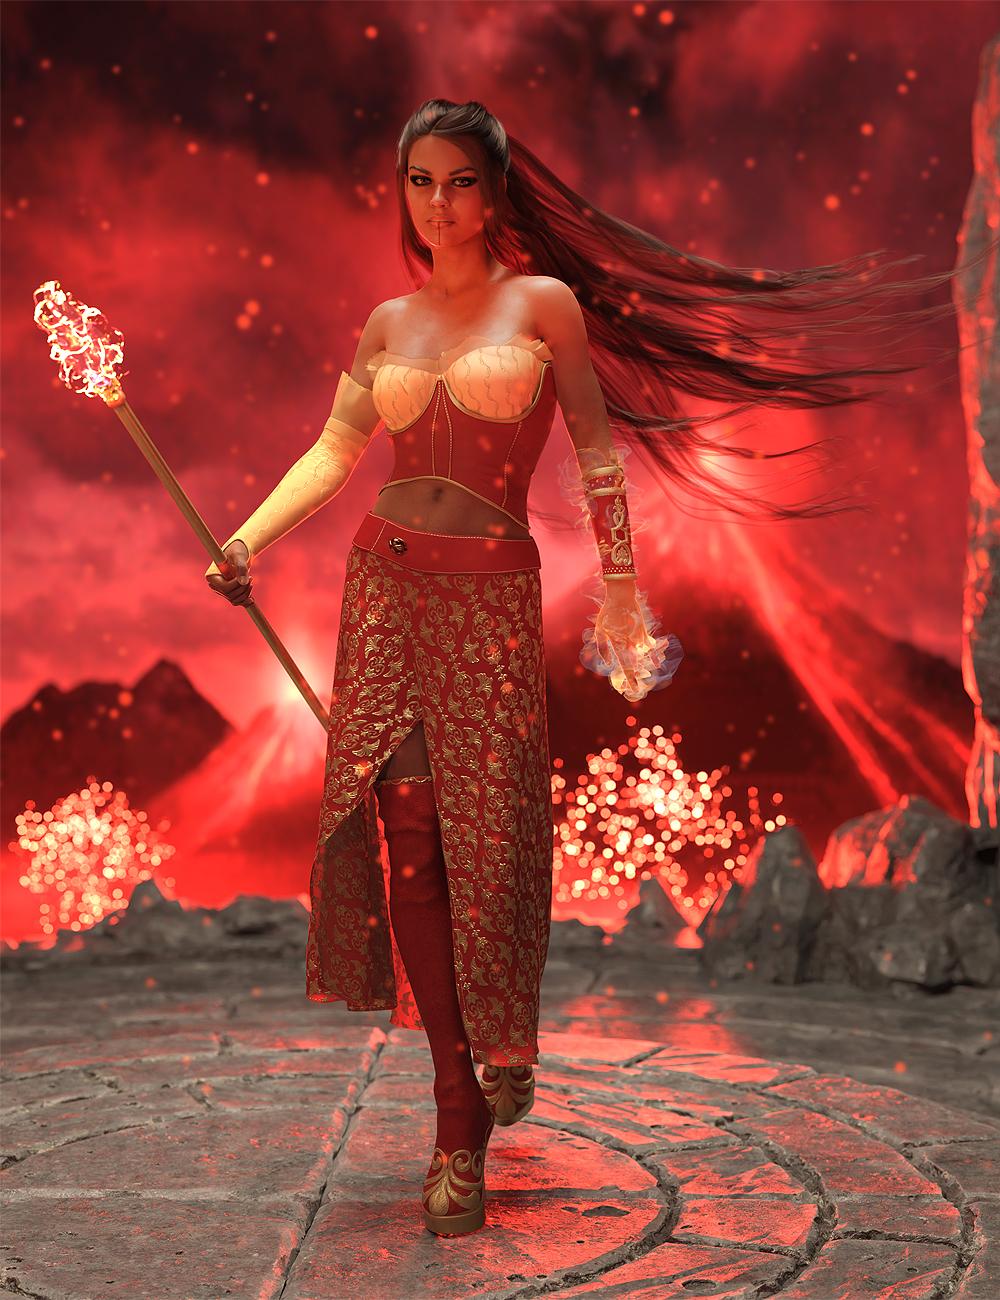 dForce Florentine Outfit for Genesis 8 and 8.1 Females by: AmaranthPixelTizzyFit, 3D Models by Daz 3D